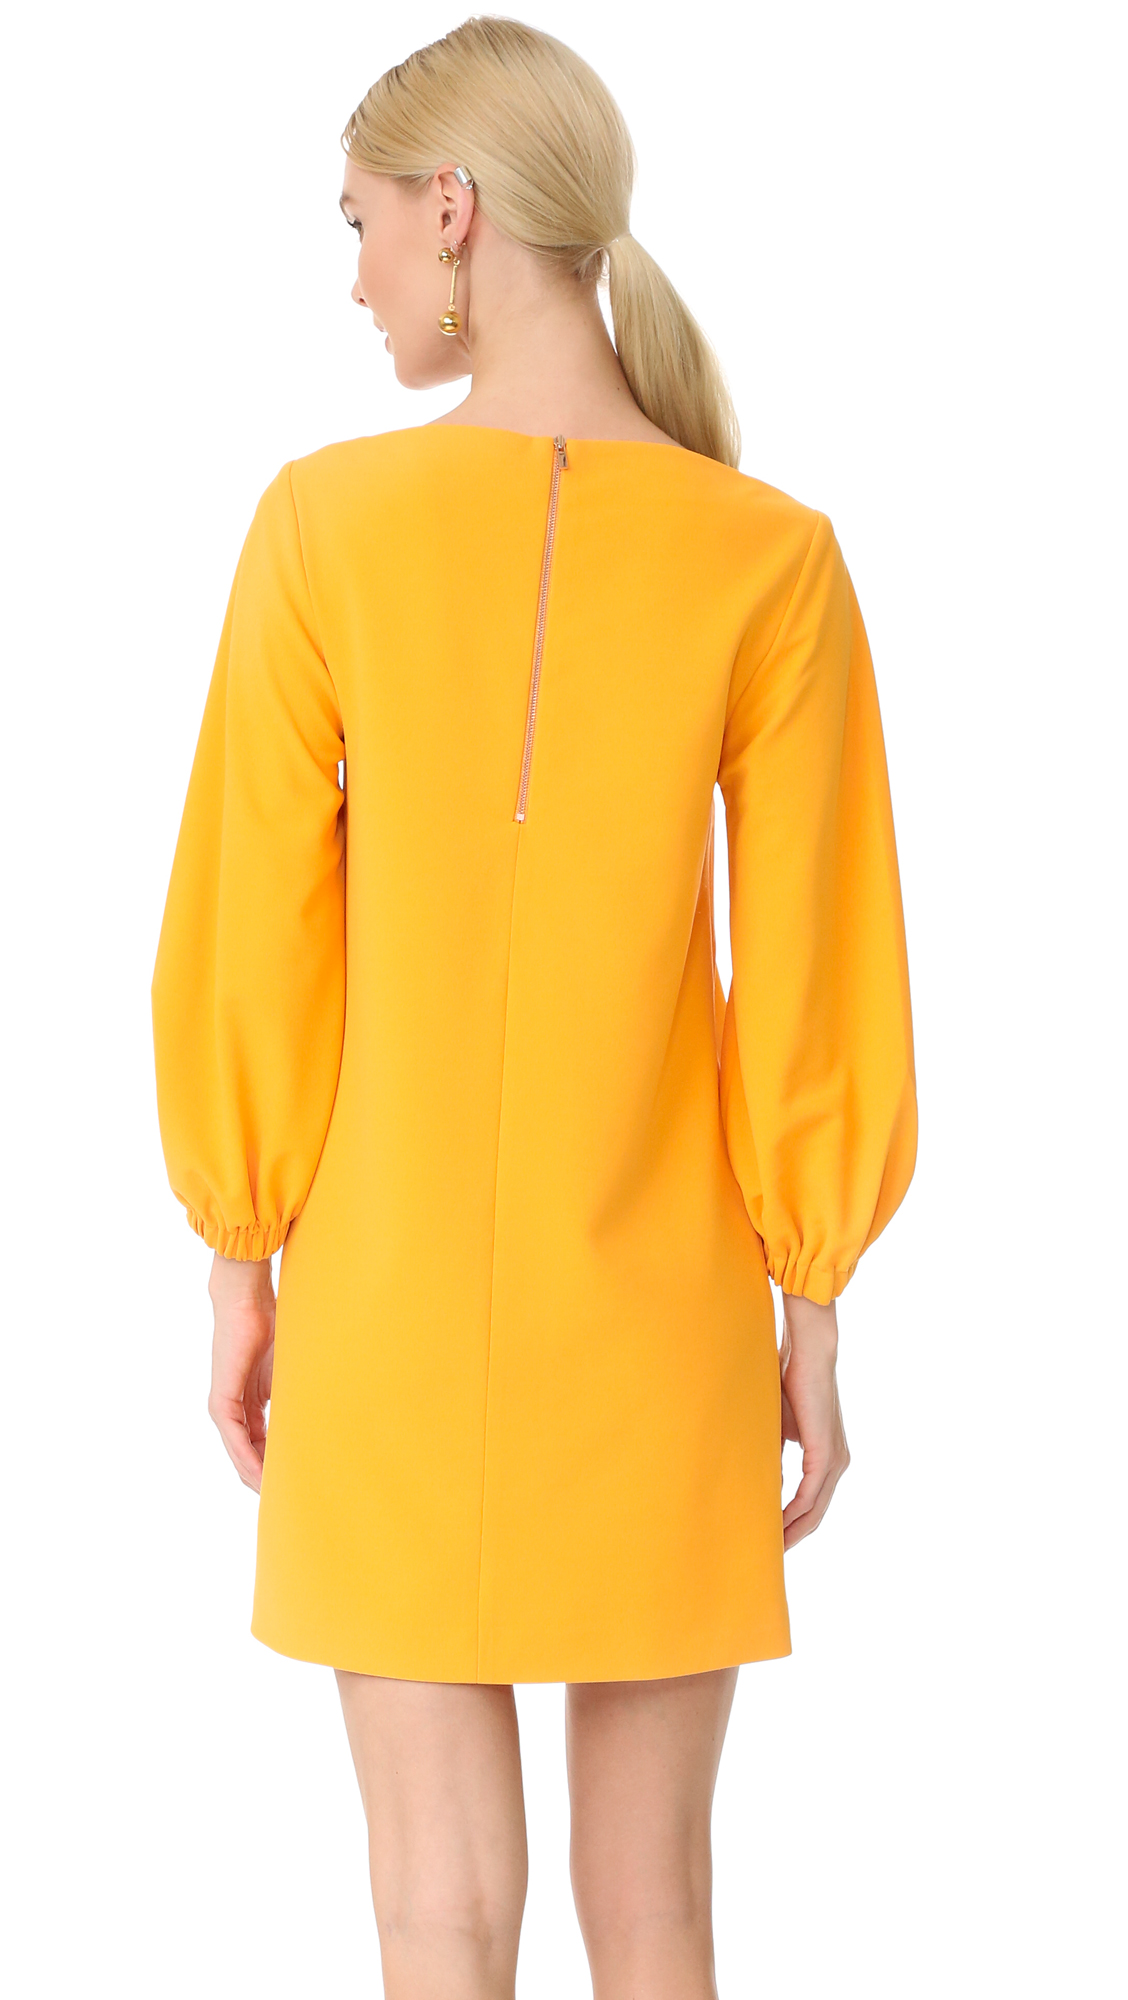 4053cdc80925 Tibi Crepe Boat Neck Dress | SHOPBOP